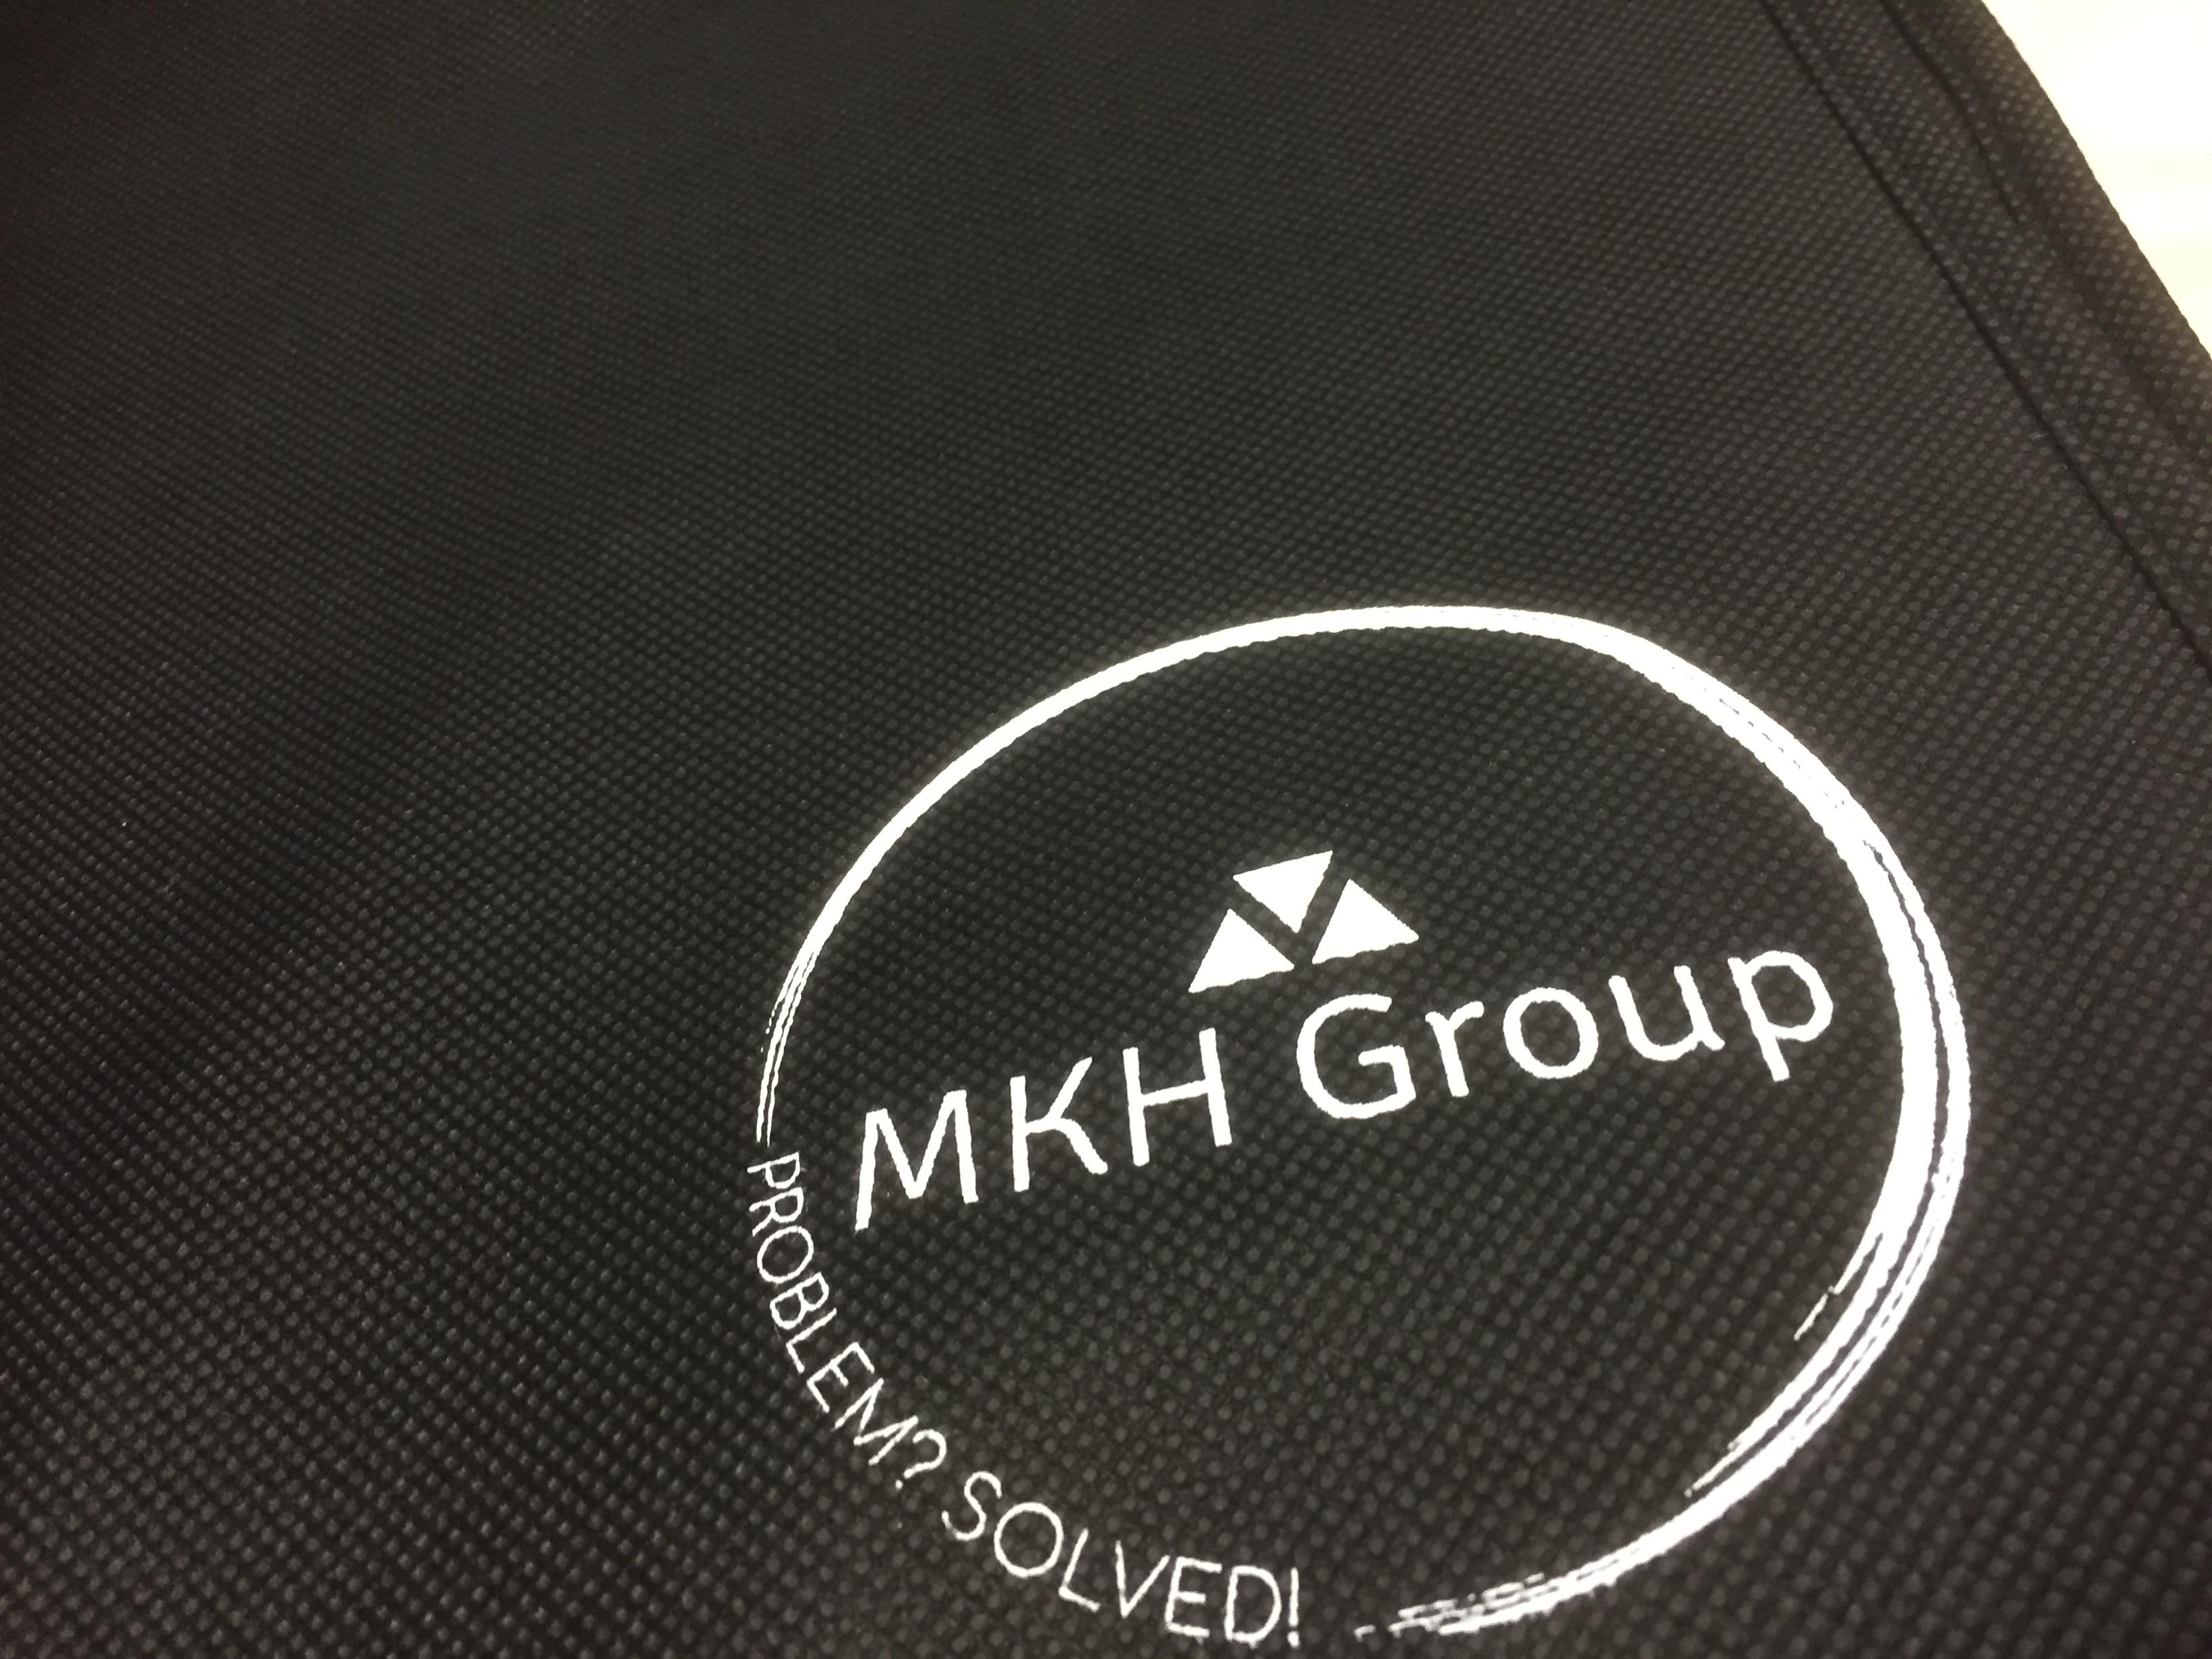 MKH Group